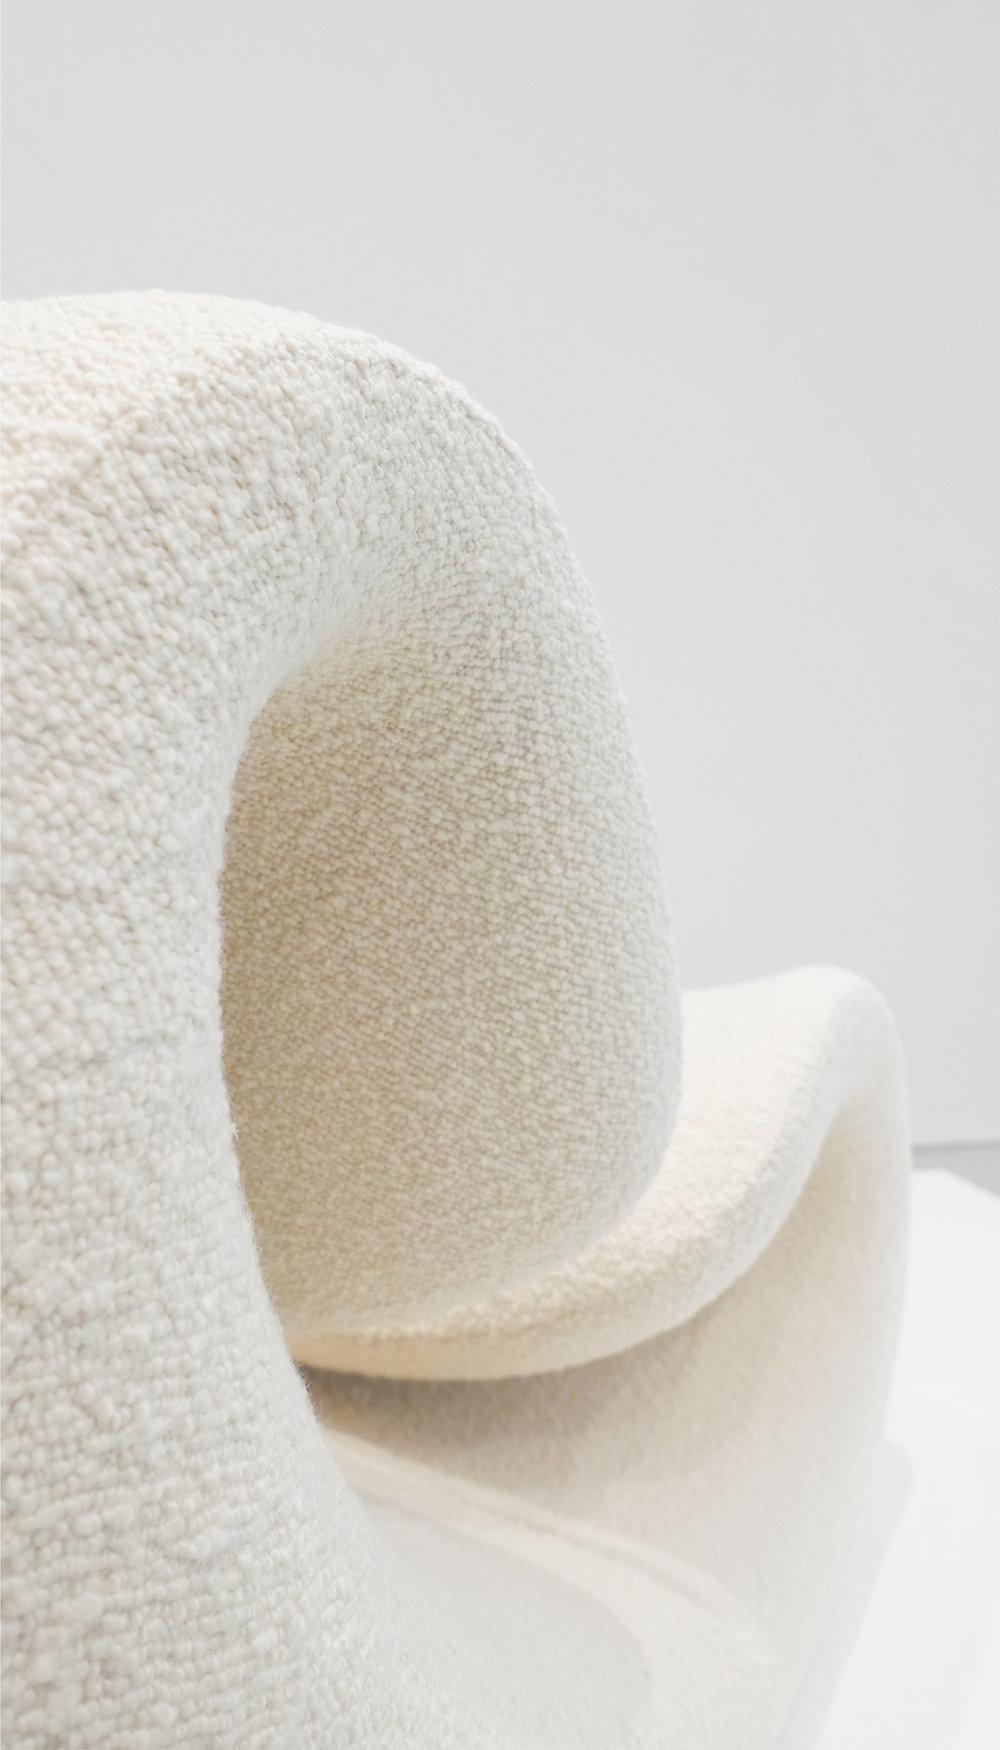 Jean-Pierre Laporte, 'Esox' Chair, c. 1970-1974, Dedar Milano Boucle Wool, Fiberglass, 35.5 H x 37 W x 28 D inches_5.jpg